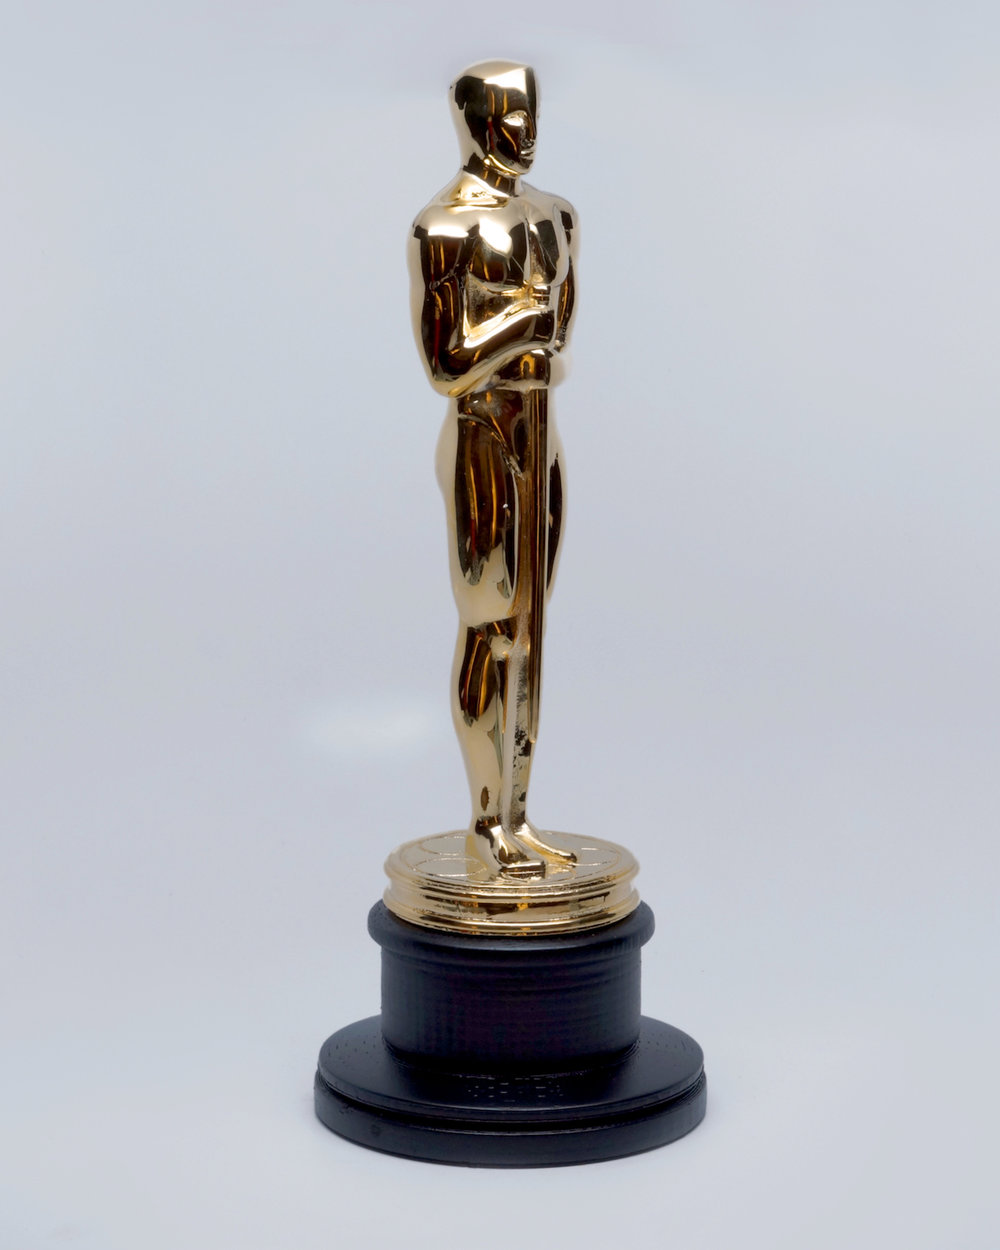 Oscar_edited.jpg